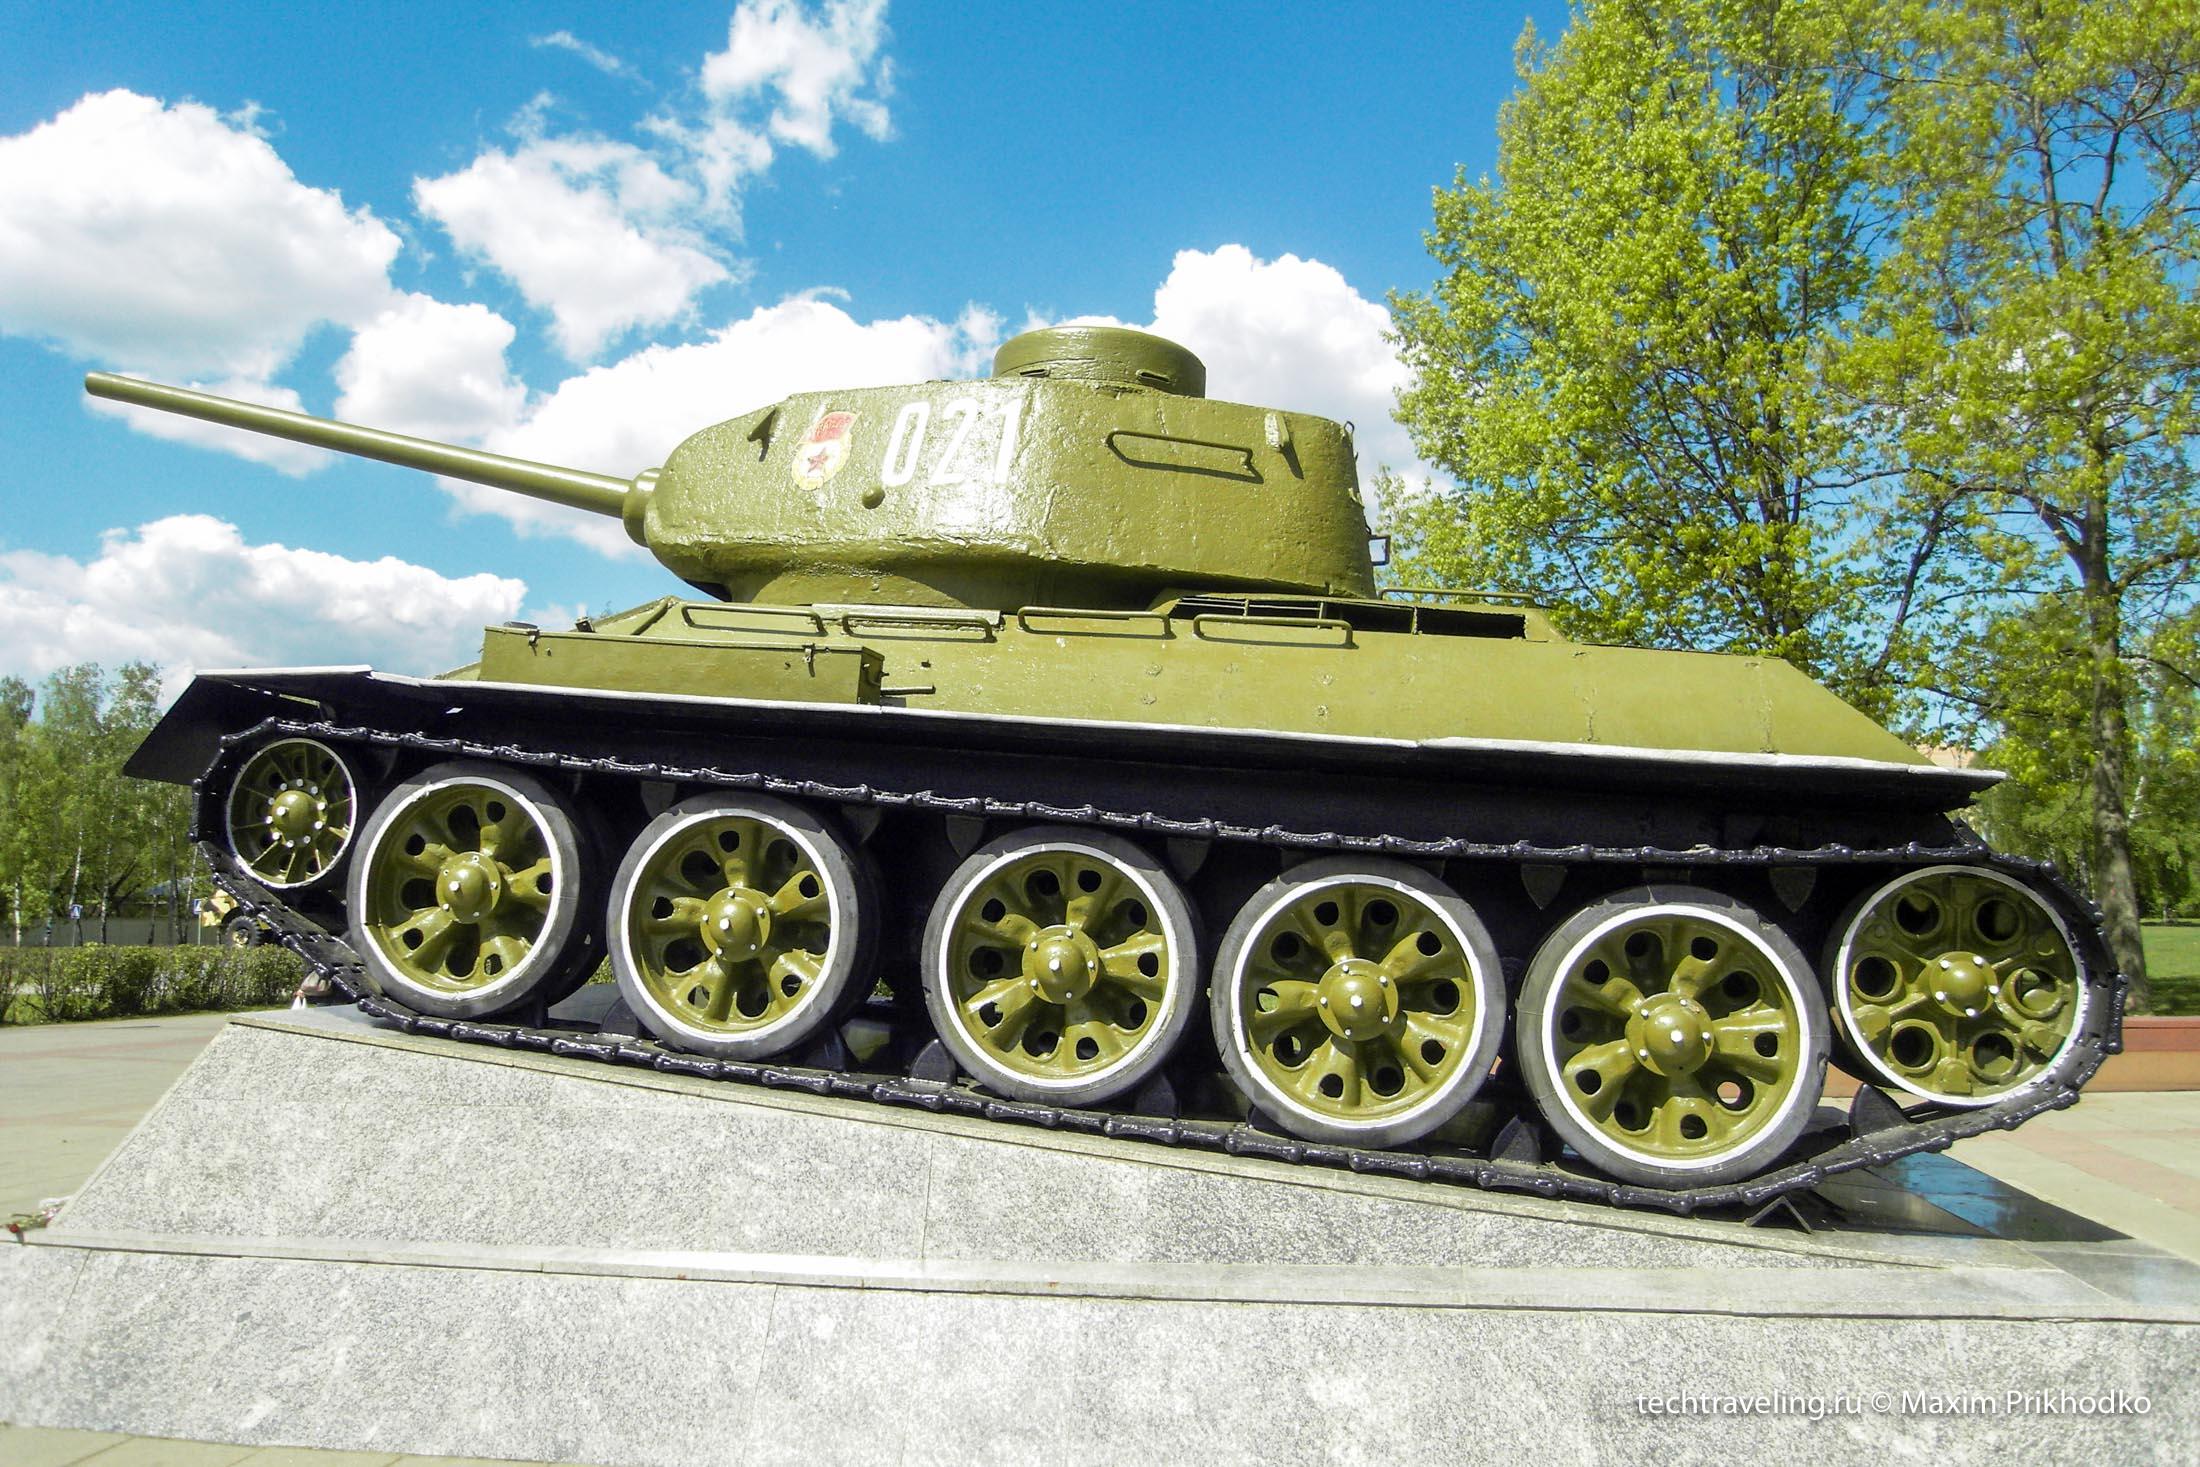 Картинка с танком т 34